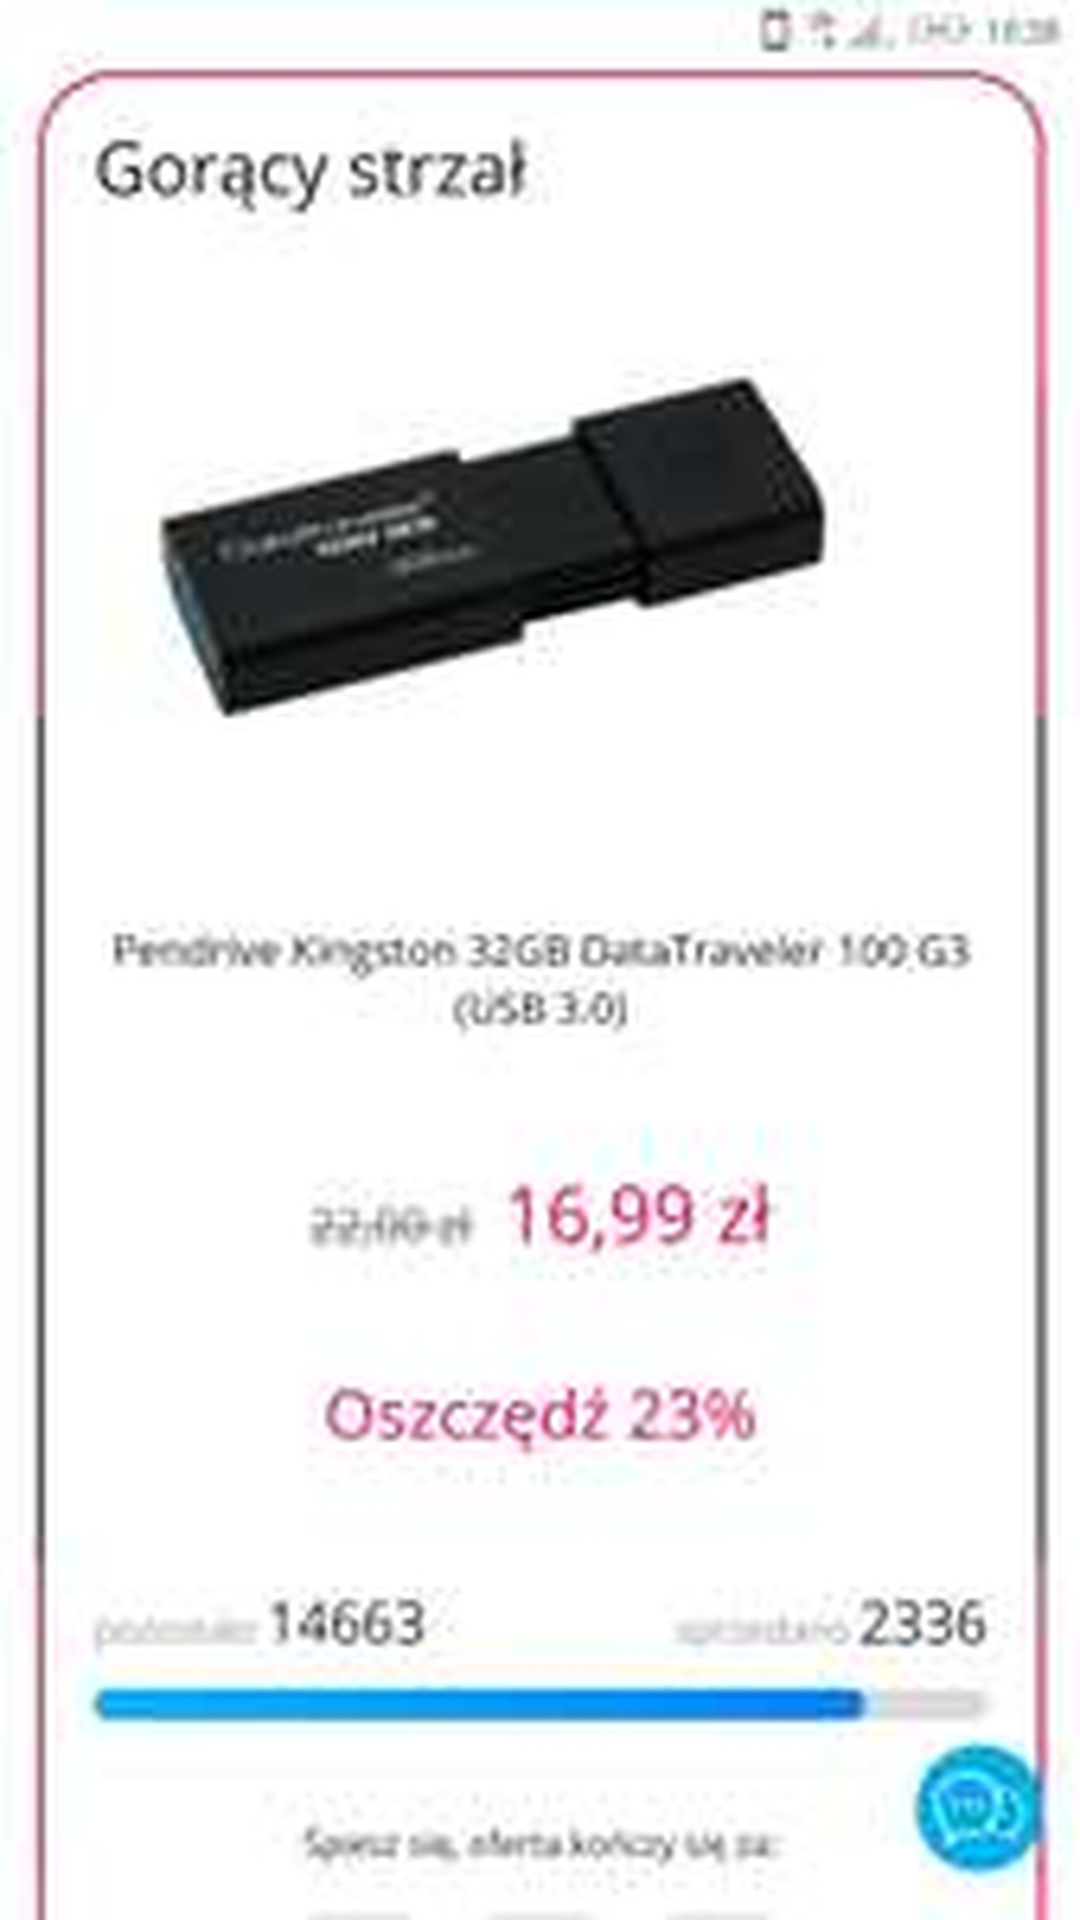 Pendrive Kingston 32GB - gorący-strzał - @x-kom